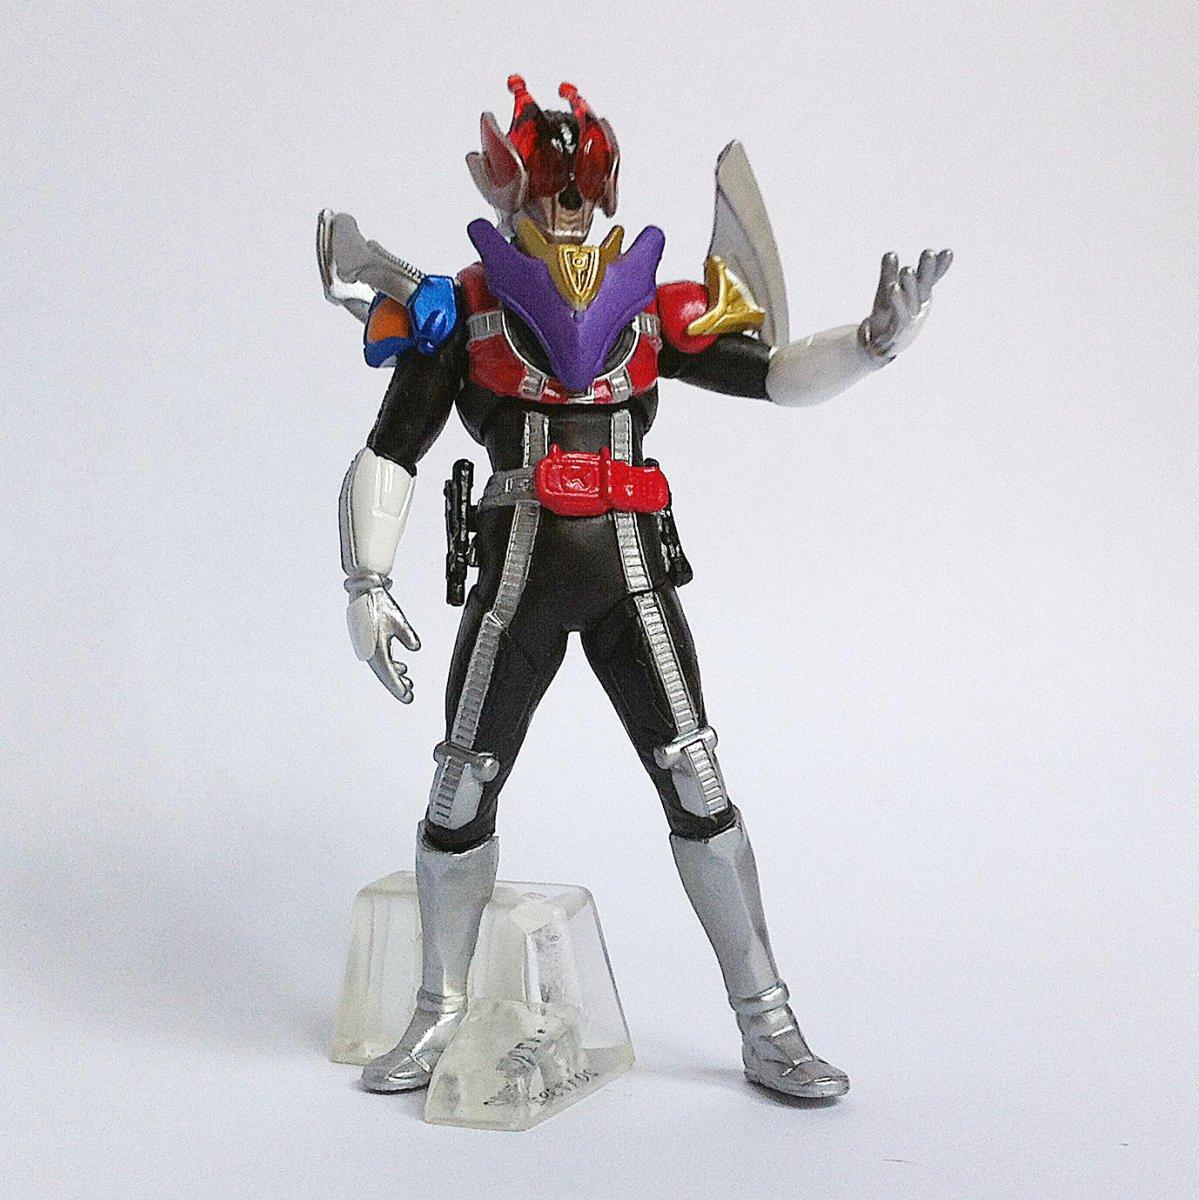 Kamen Rider Den�O Climax Form from HG CORE Kamen Rider by Bandai